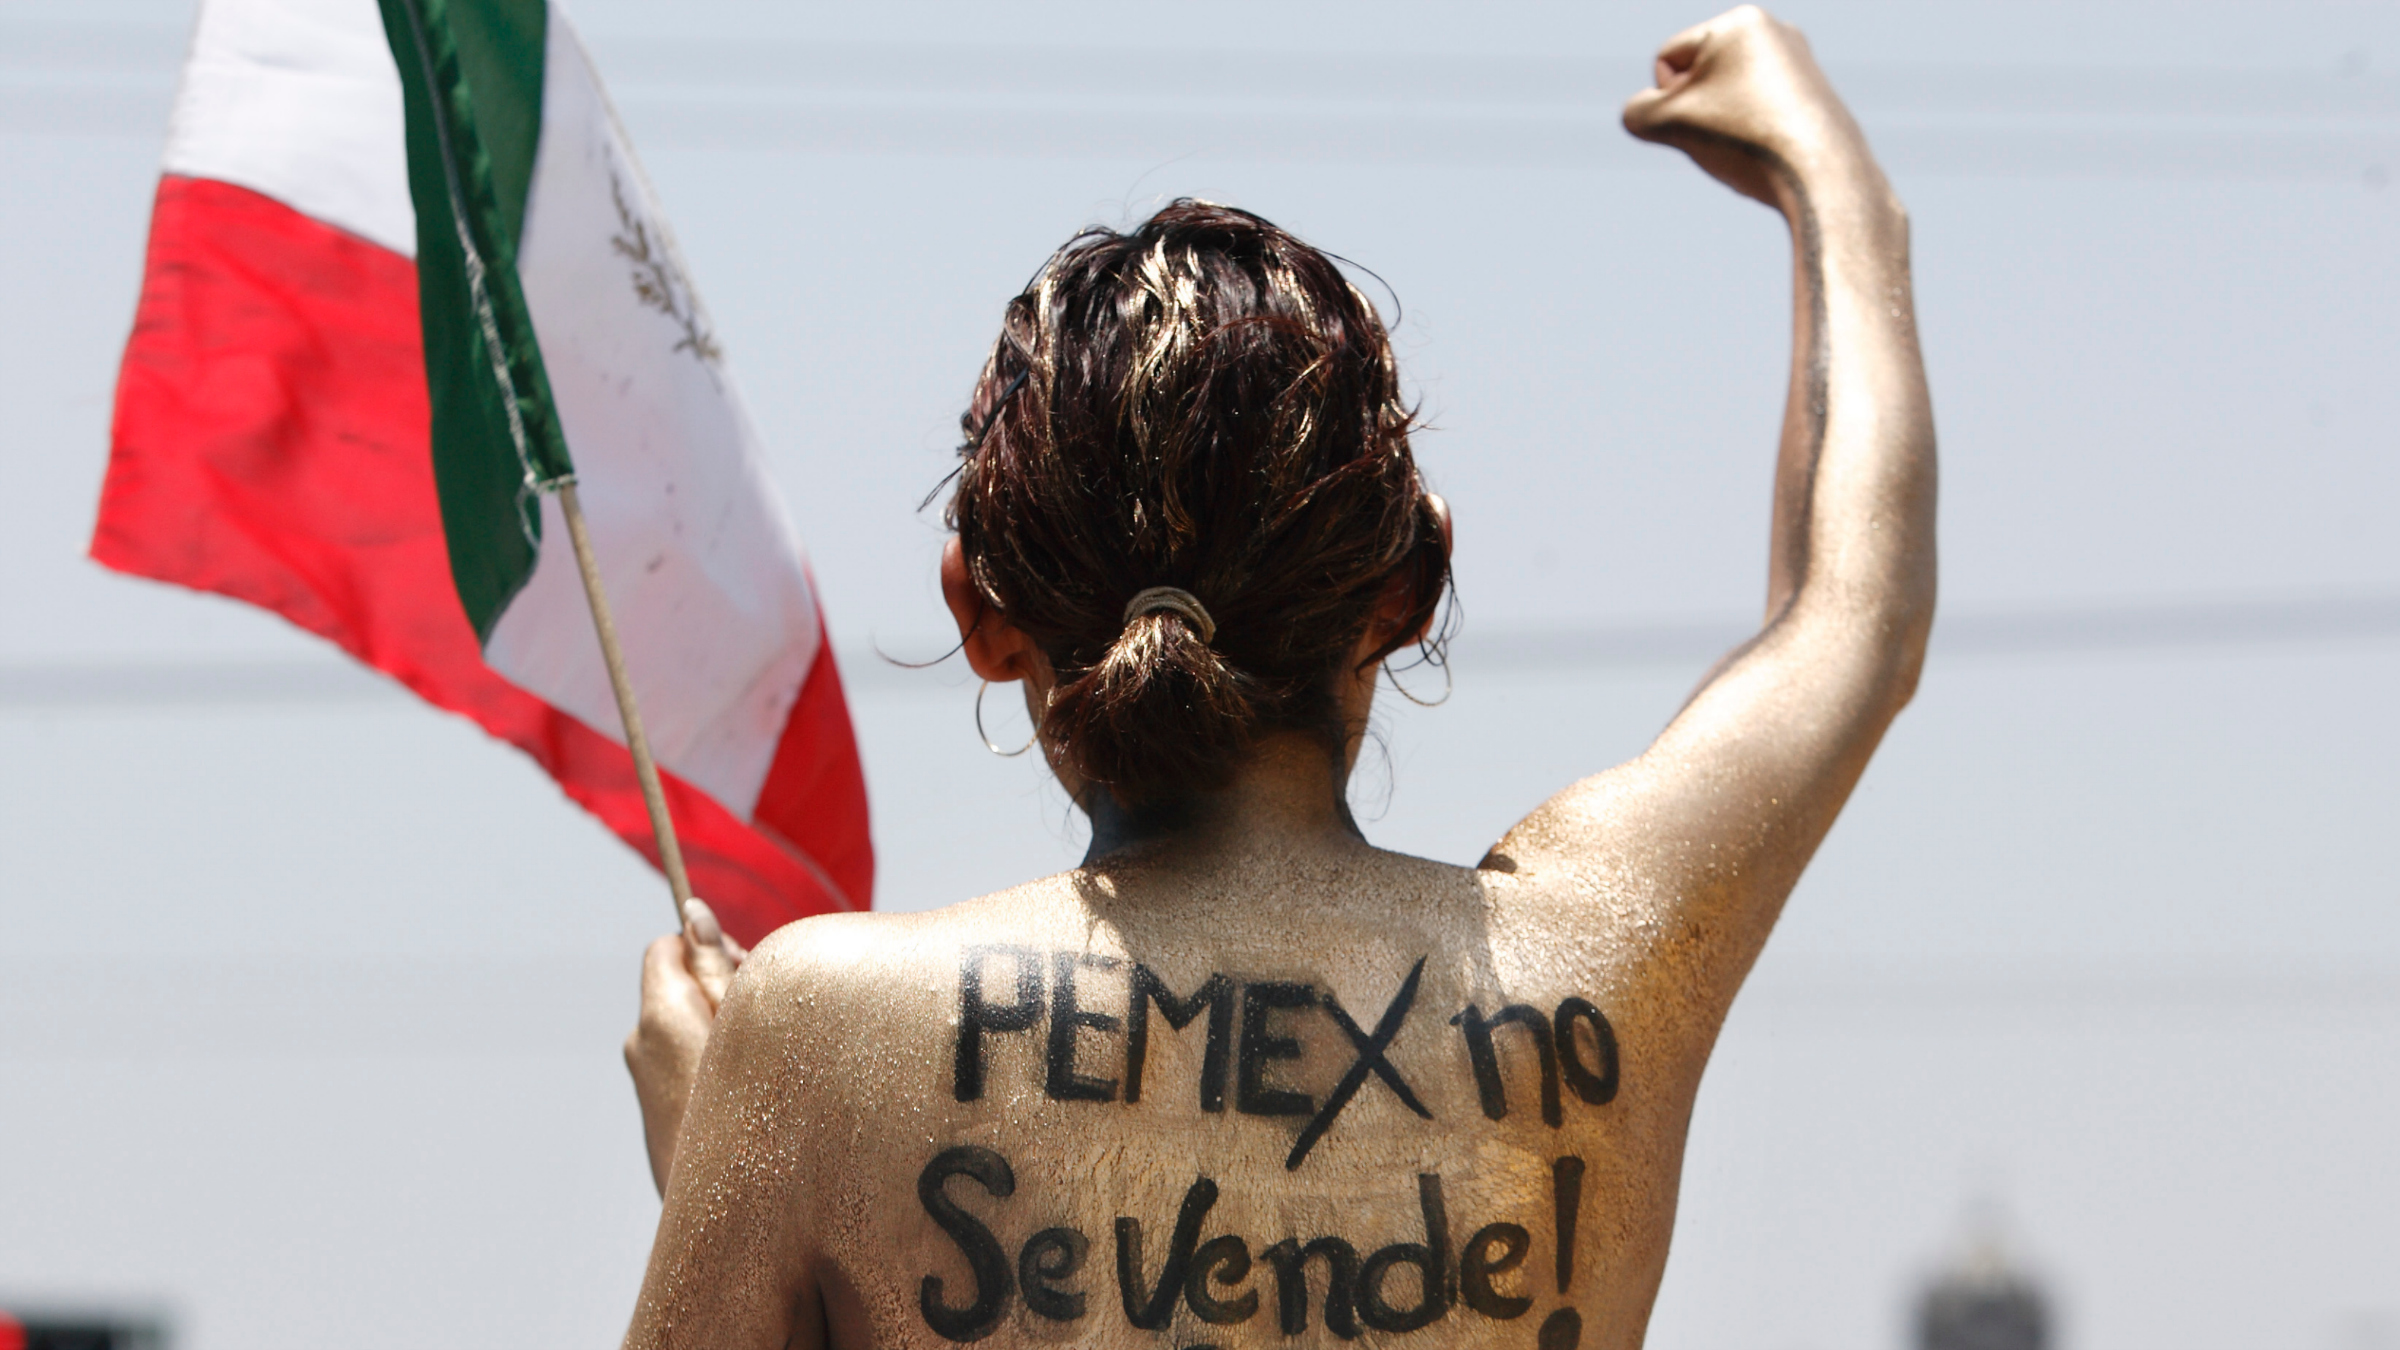 PEMEX protestor